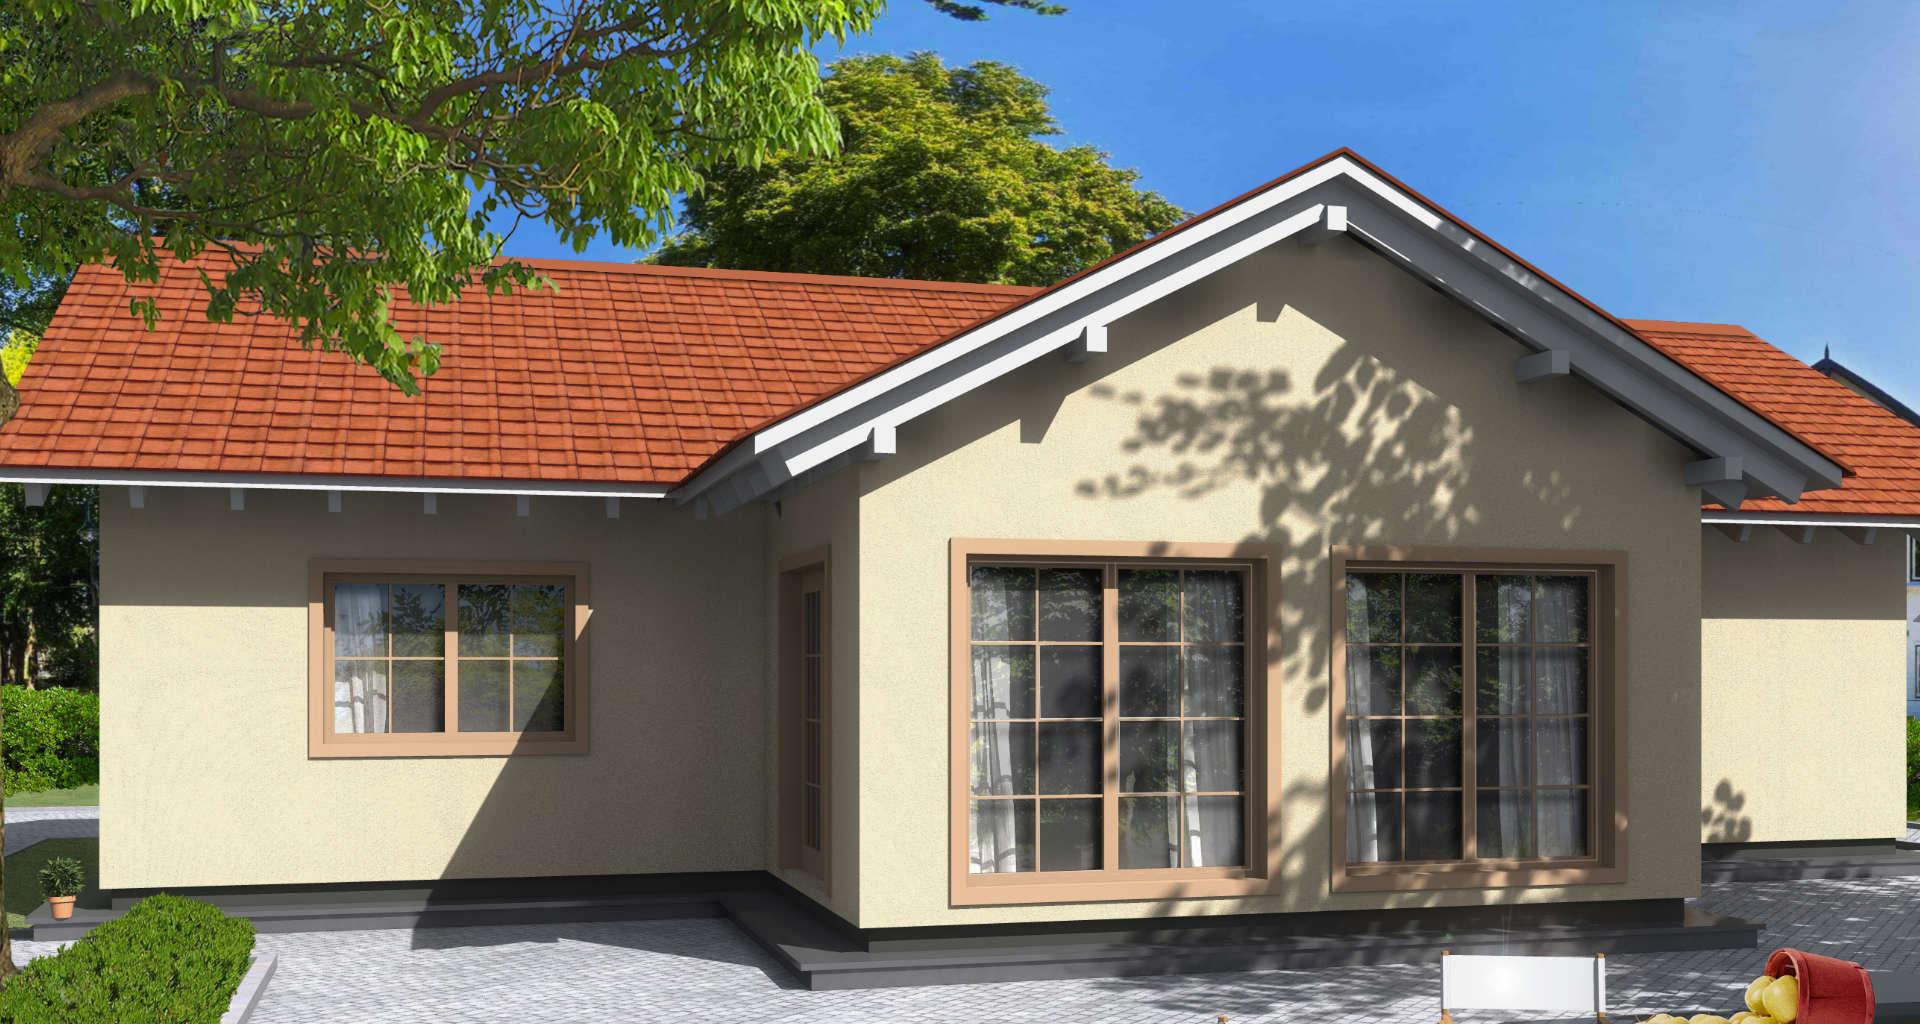 Želite postaviti montažno hišo? Pomagali vam bomo najti pravega ponudnika montažnih hiš